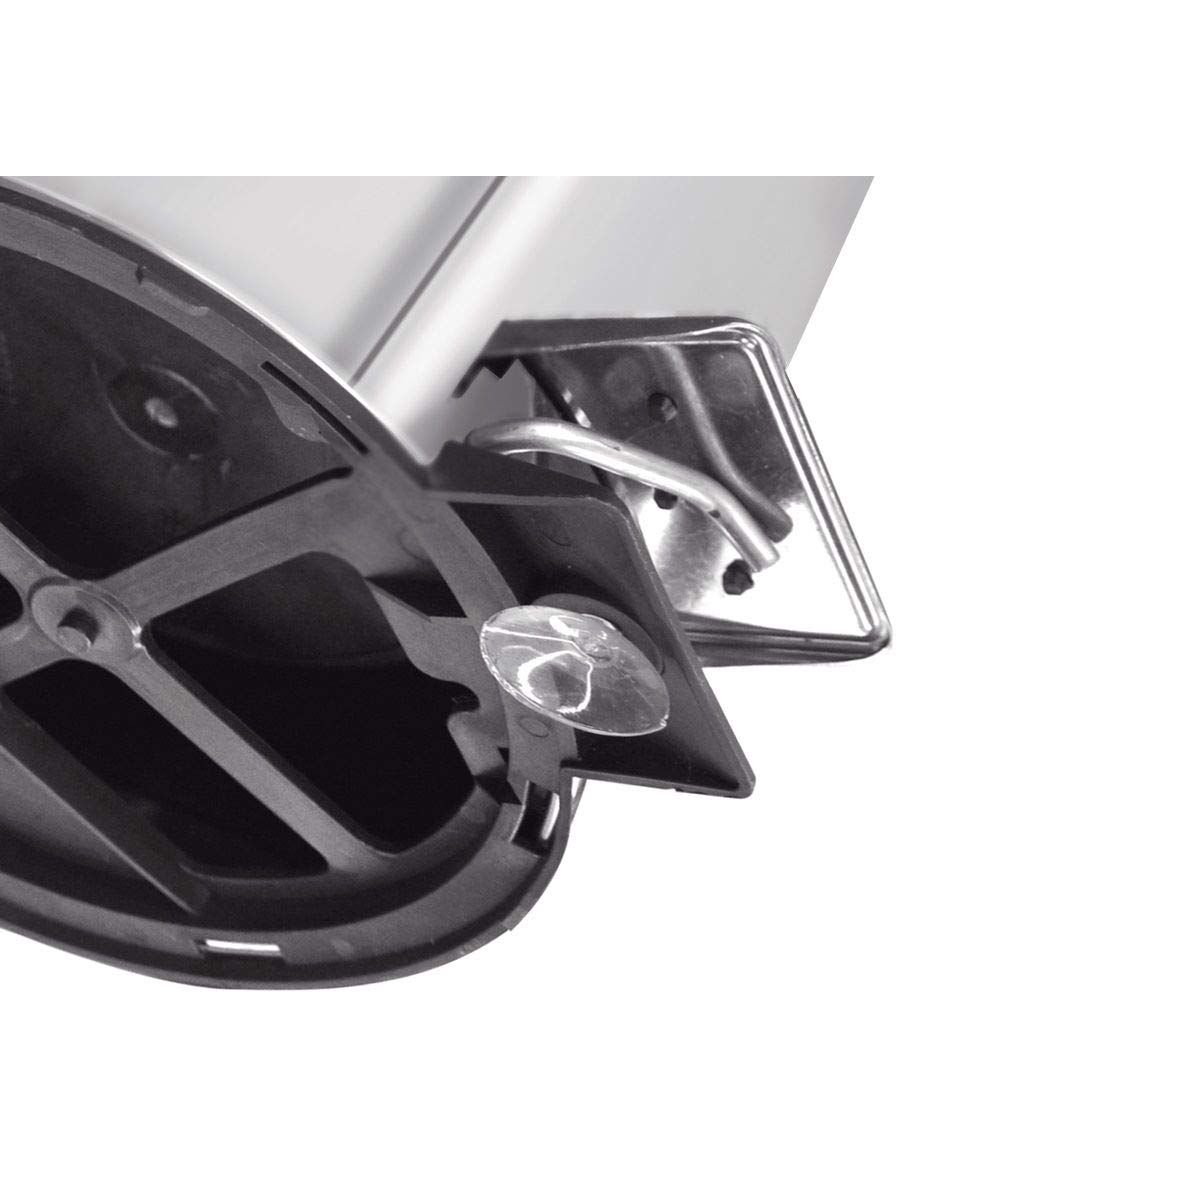 Lixeira Tramontina Brasil Inox com Pedal - 3L